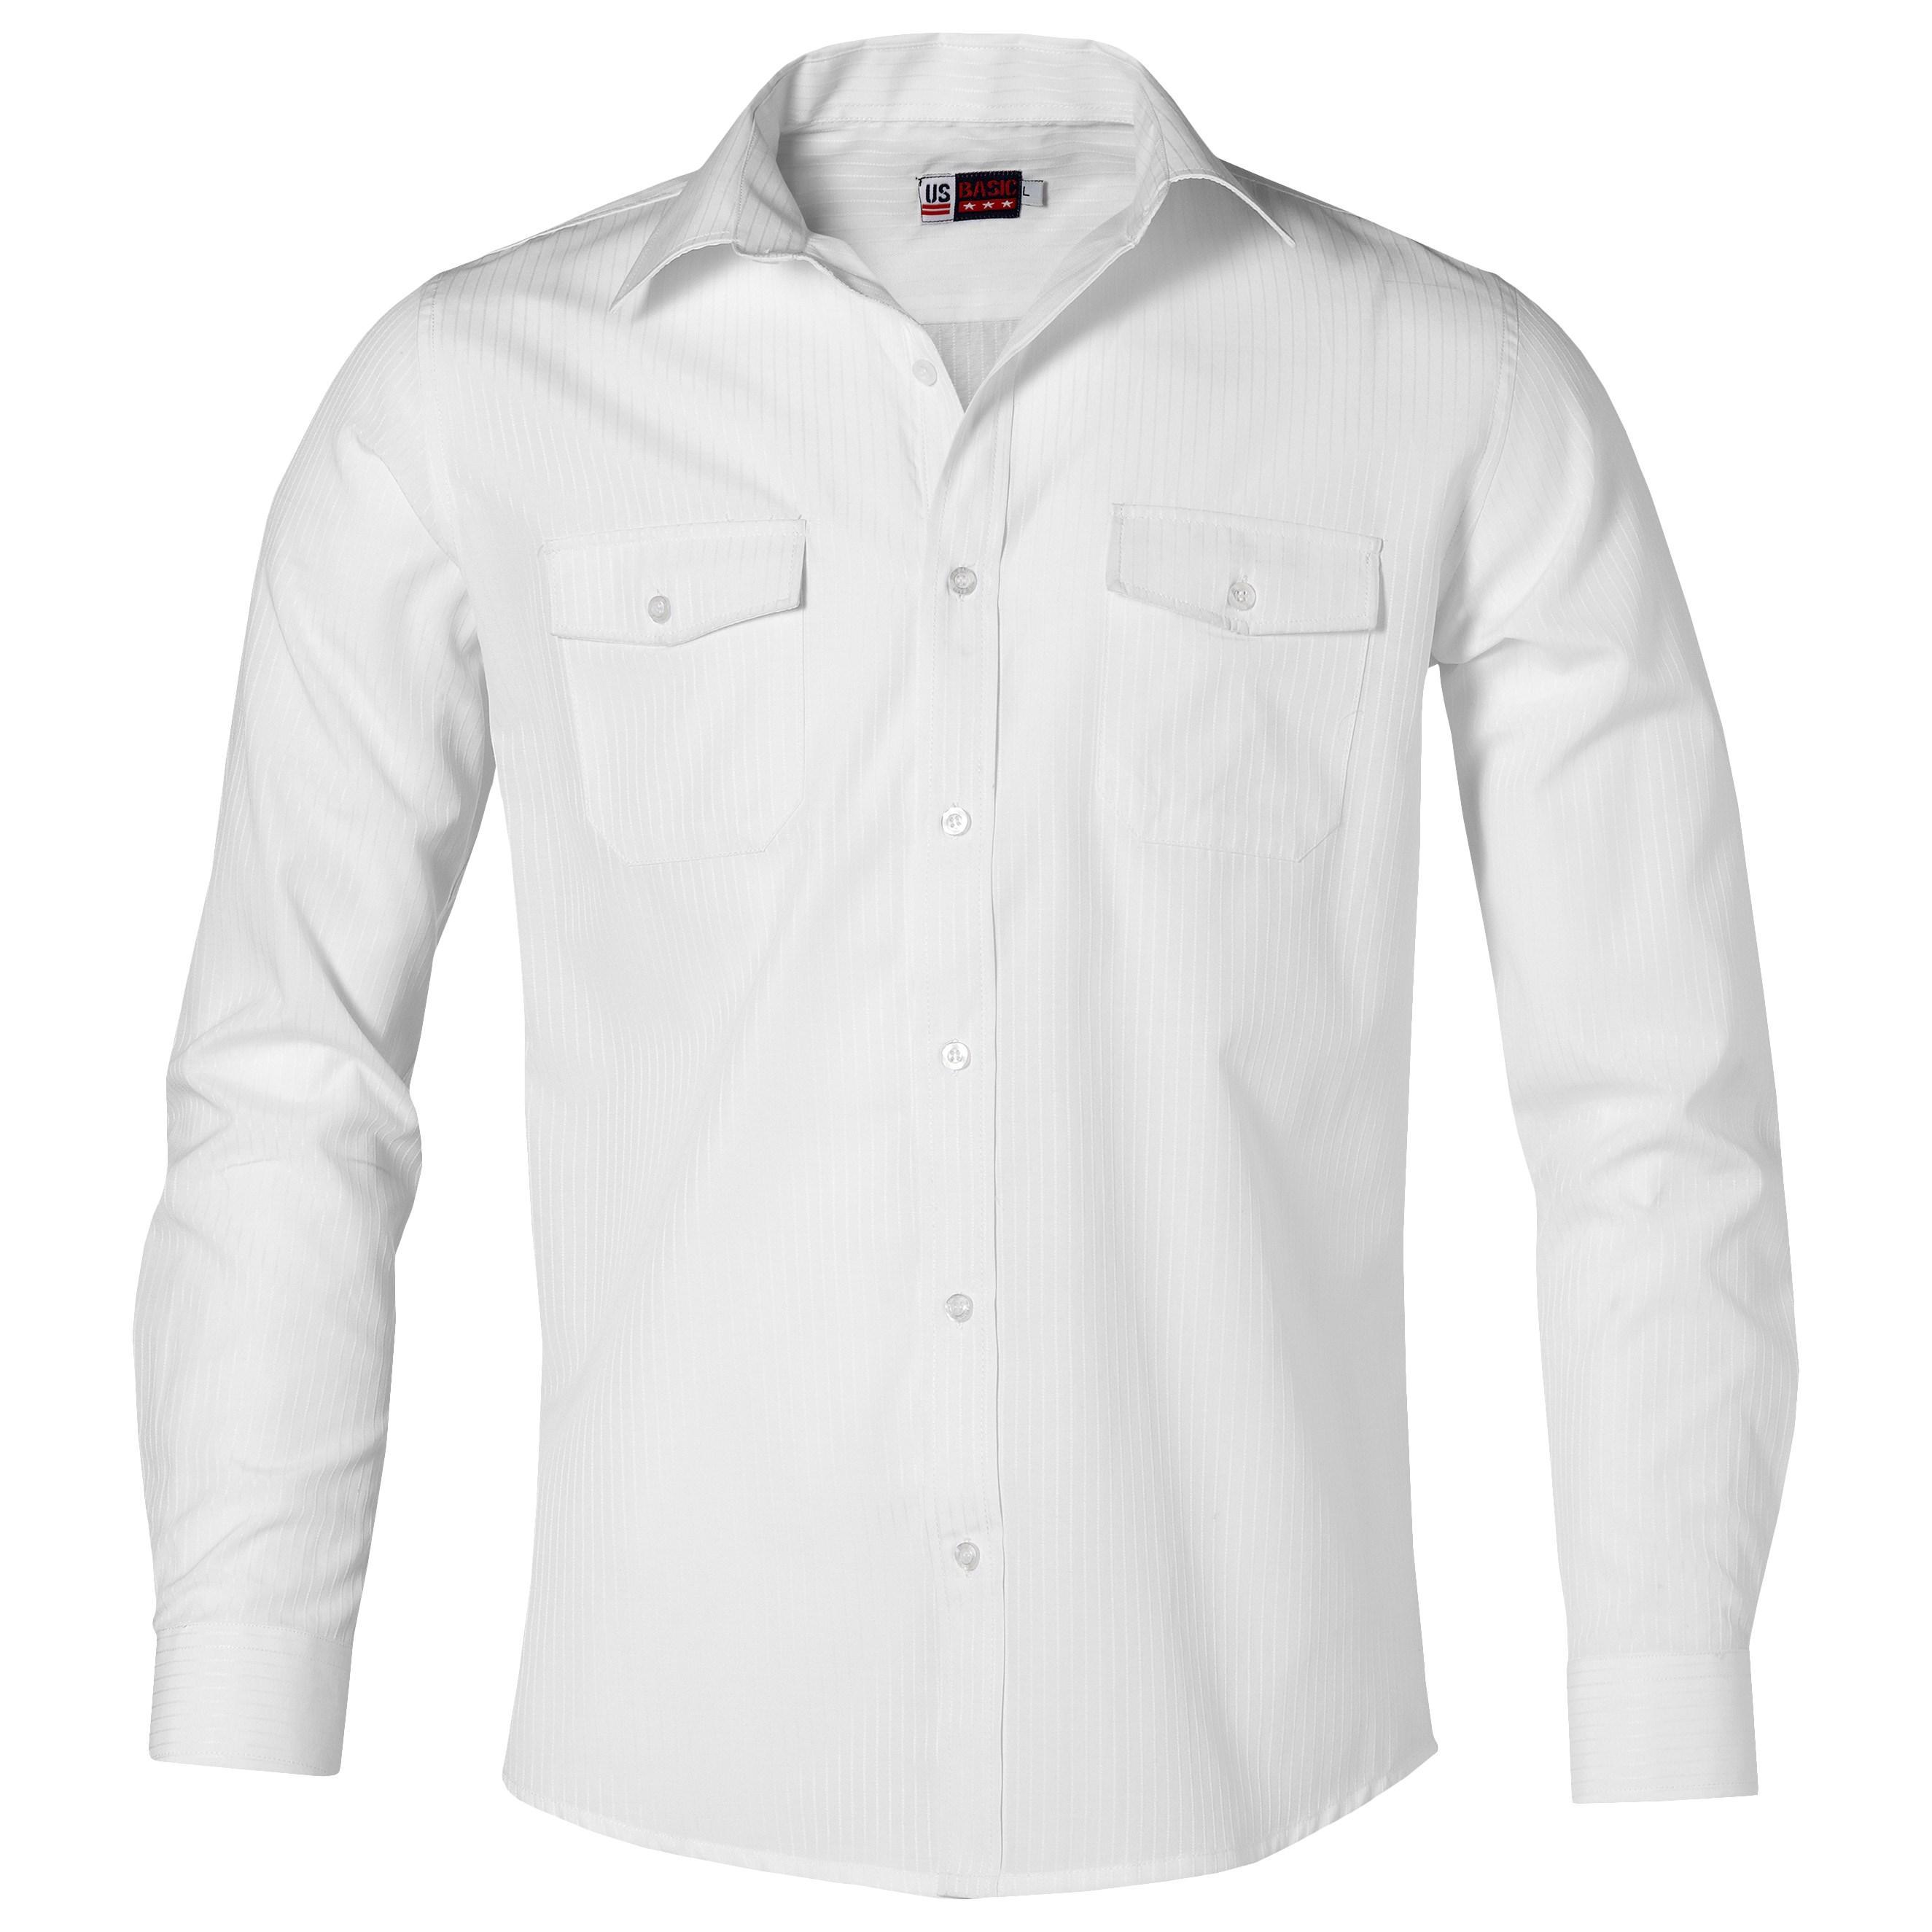 Mens Long Sleeve Bayport Shirt -white Only